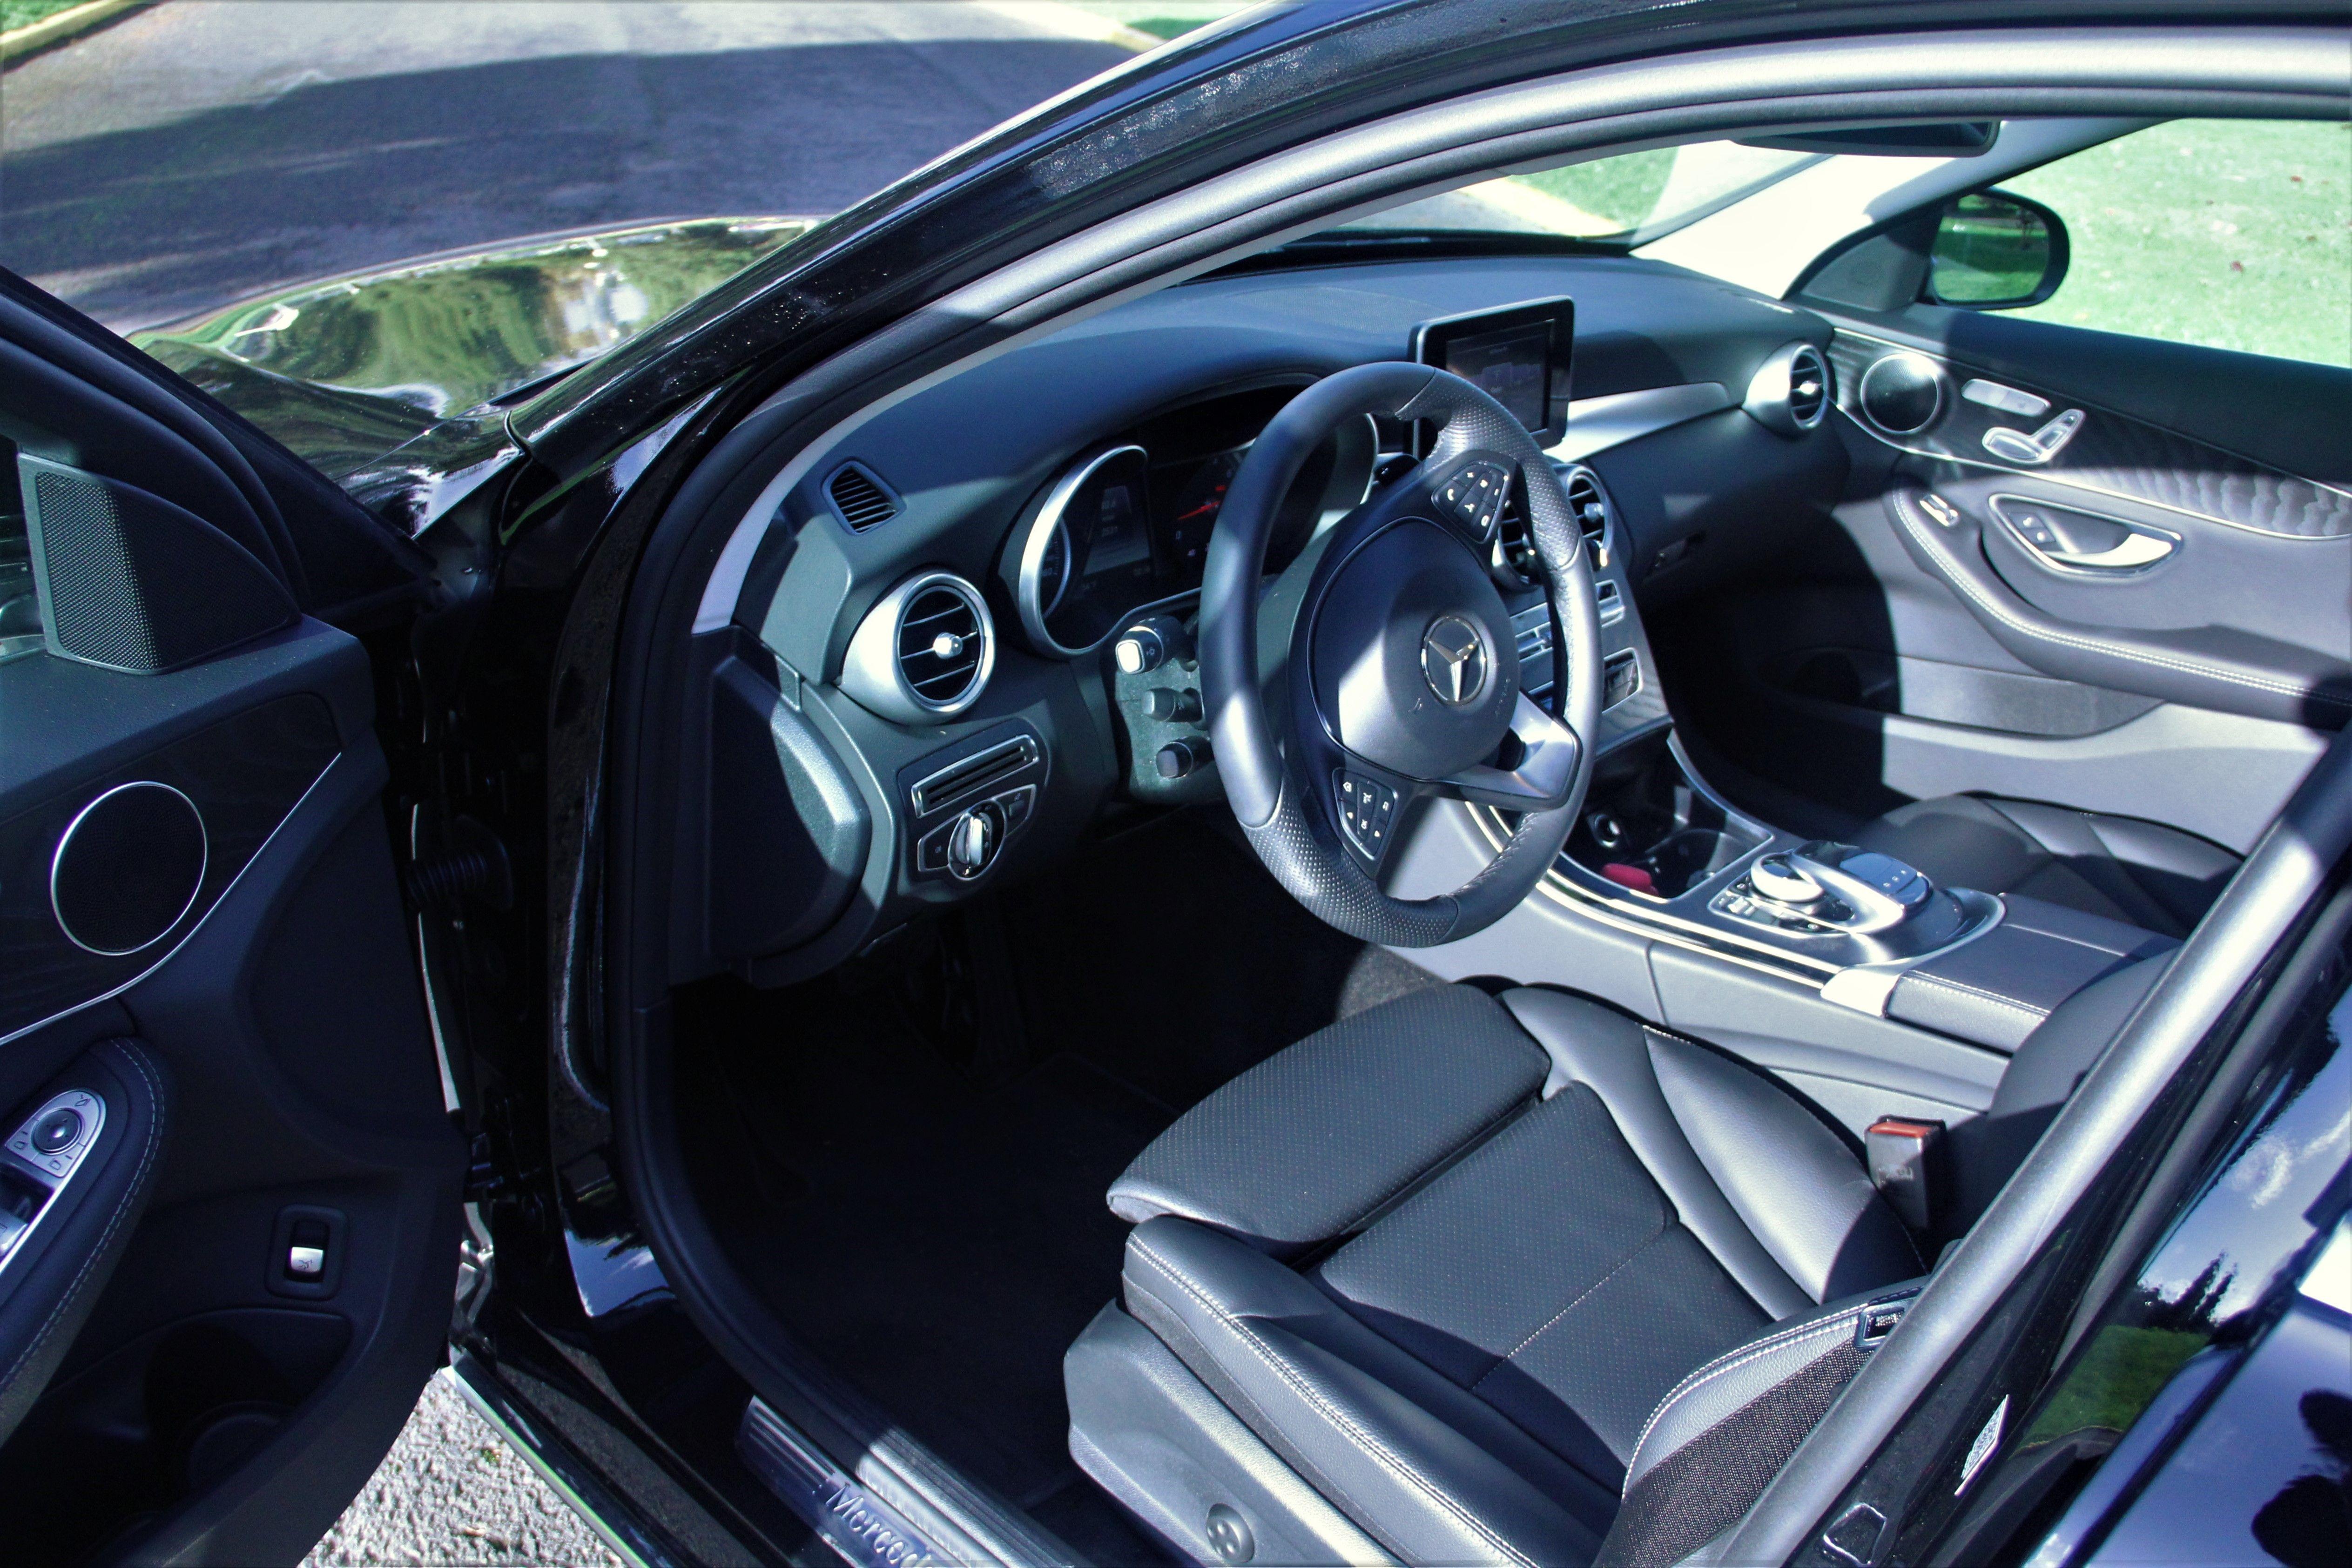 Get 25 Credit For Portland Car Rental 2016 Mercedes Benz C300 Https Turo Com C Yaroslavm Mercedes Benz C300 Car Rental